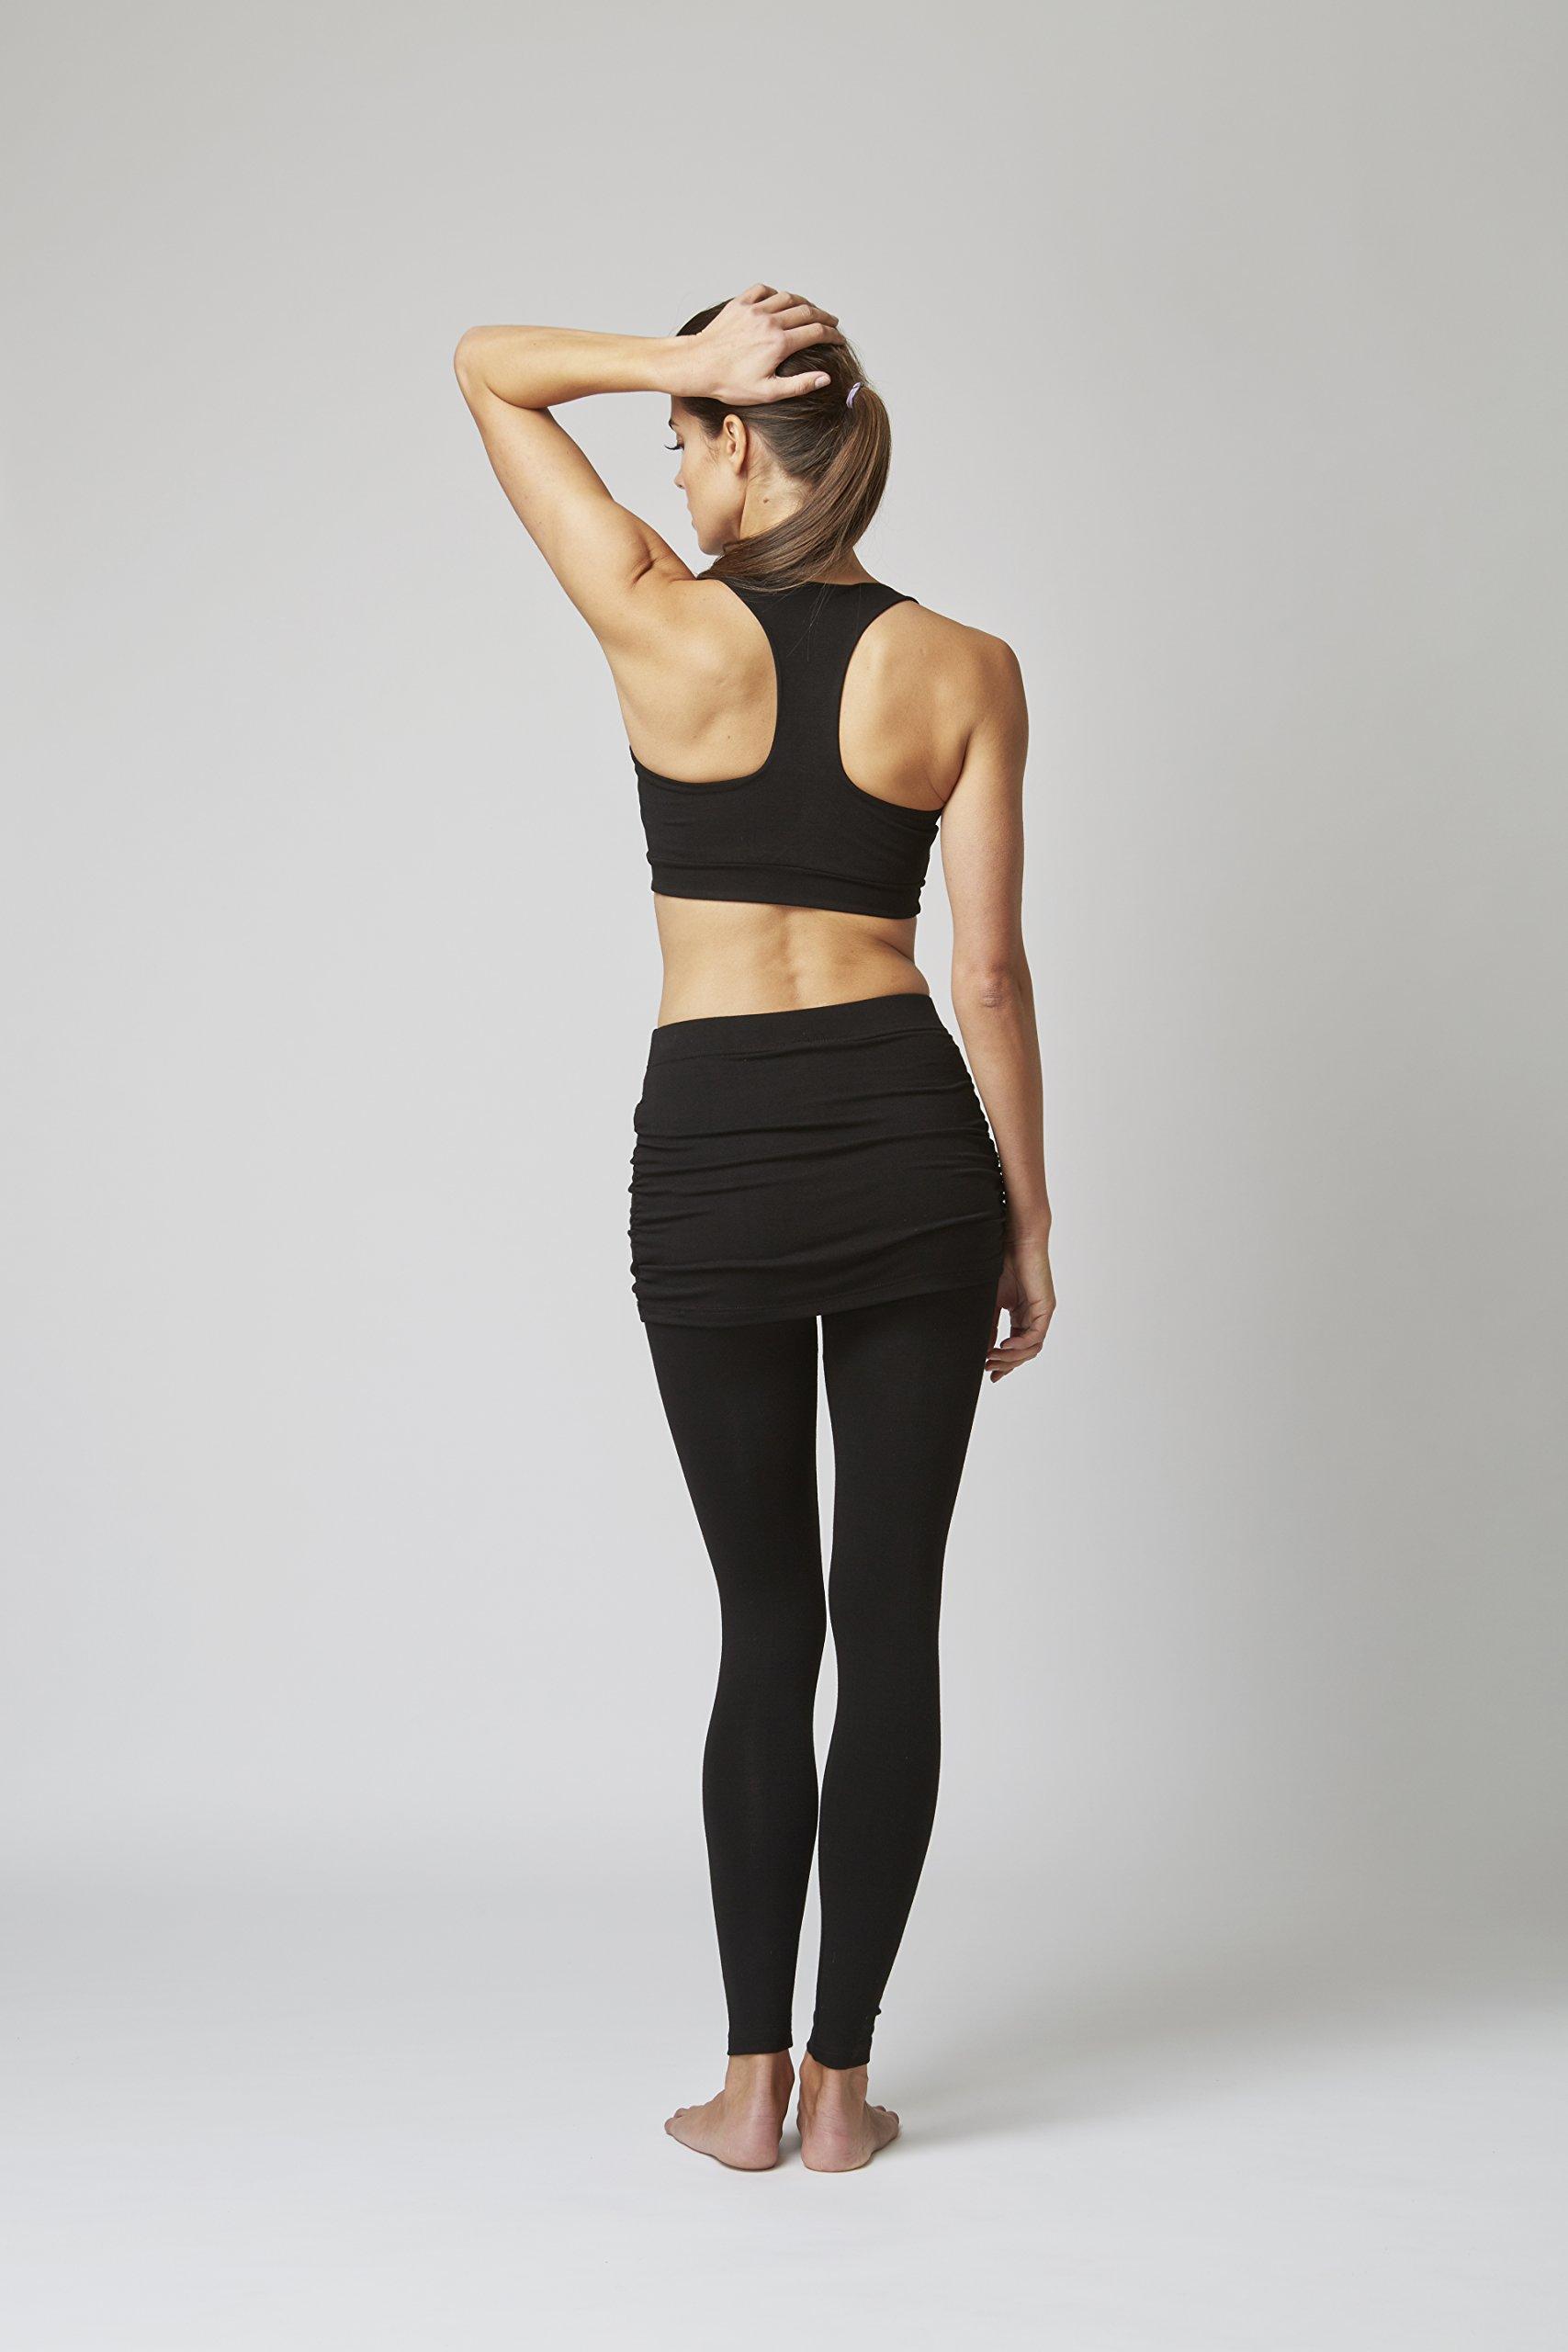 71gzt29NqmL - TLC Sport Stay Strong Offer Women's Lightweight Waisted Gathered Skirt Leggings Black